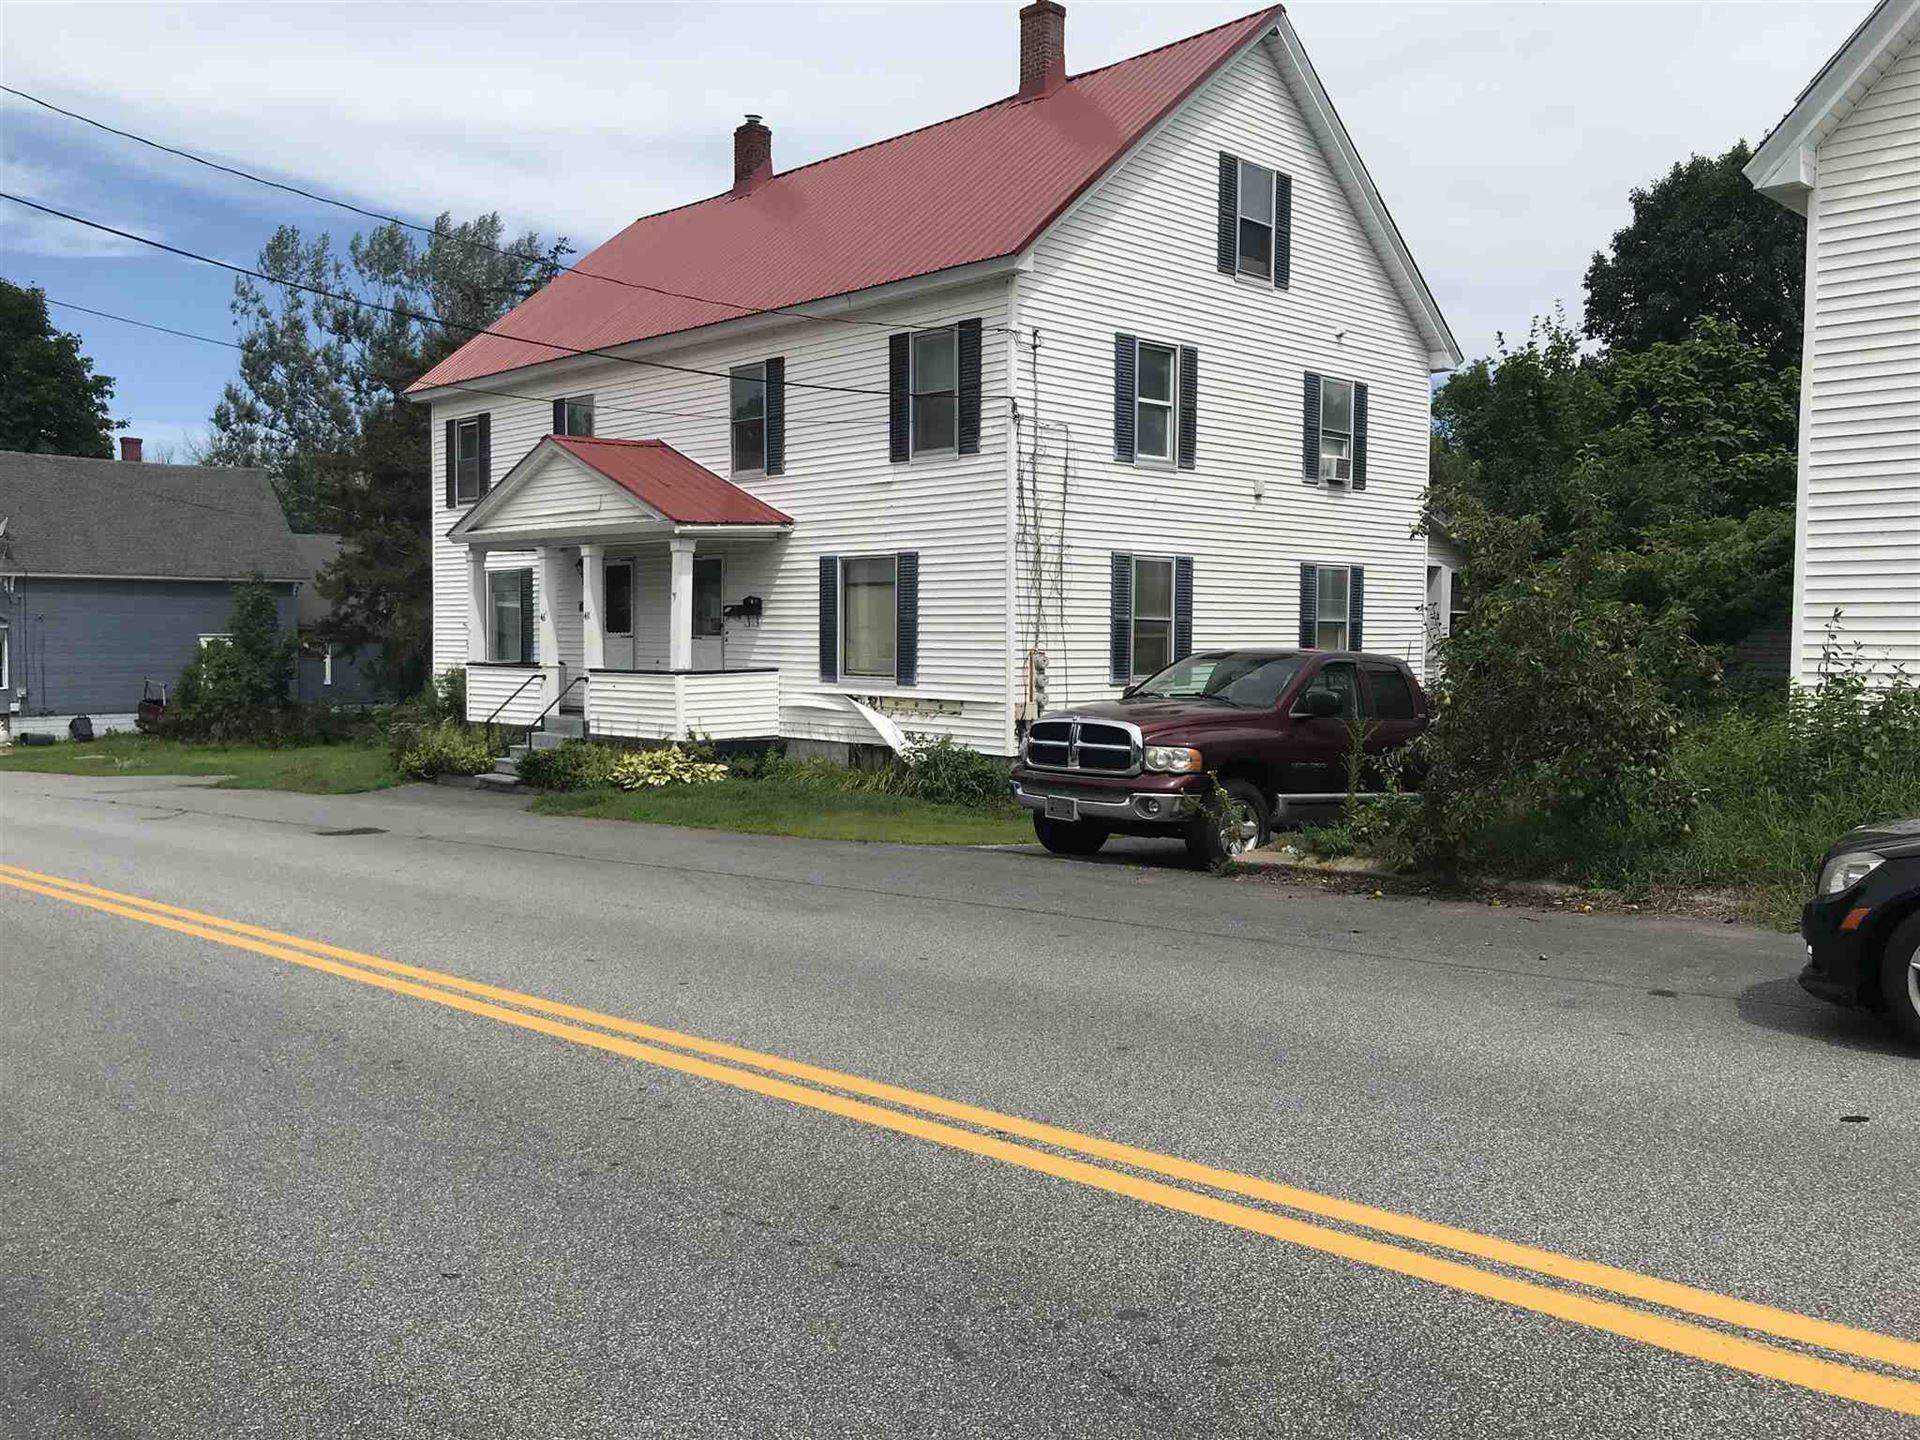 46 Winter Street, Laconia, NH 03246 - MLS#: 4822782